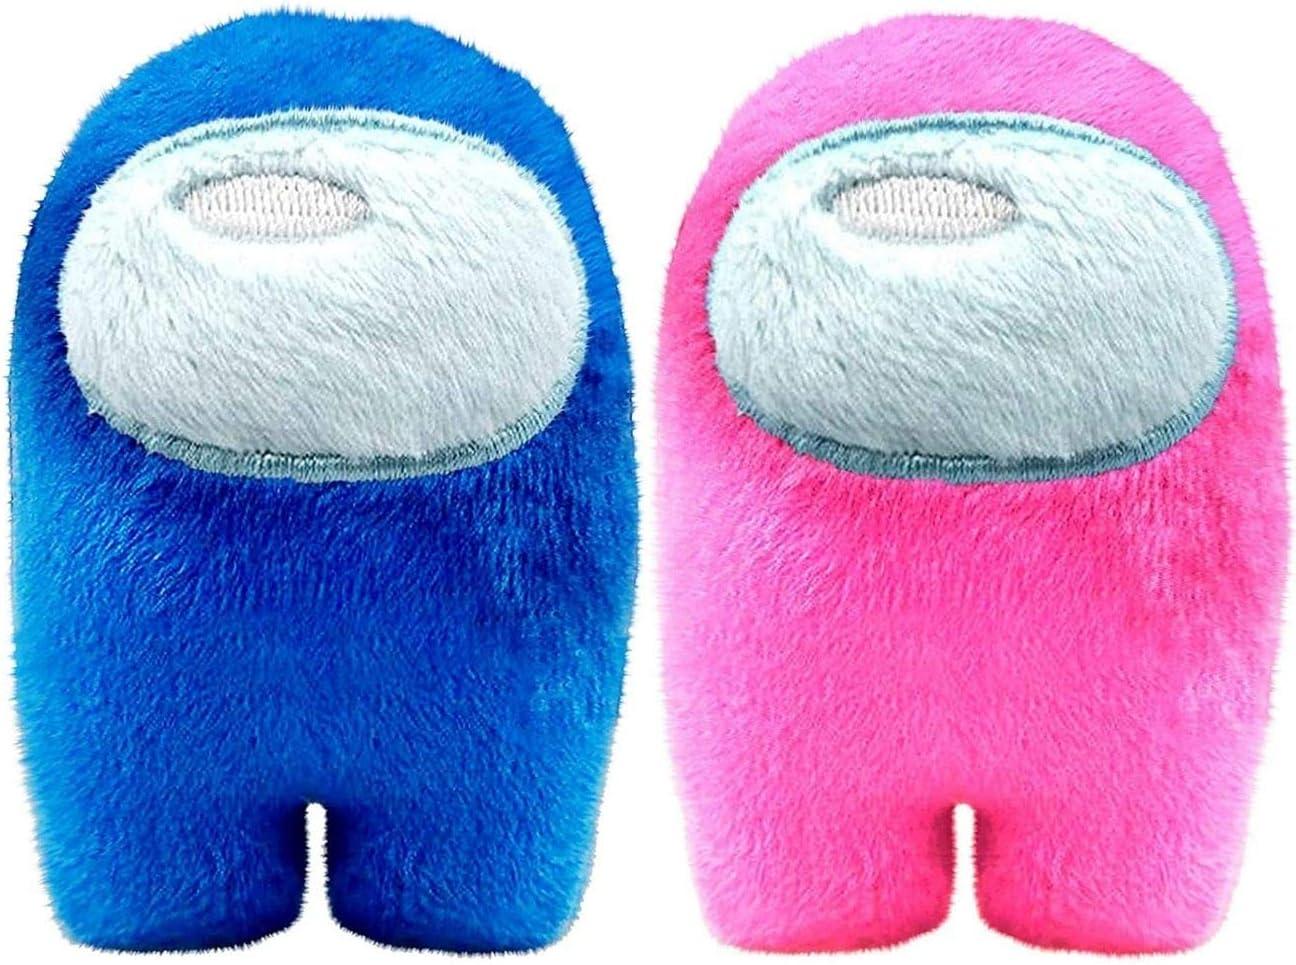 Among Us Game Plush Toys   Soft Stuffed Animals Imposter Plush Squeak Plushie Figure 3.9inch (Blue Pink)